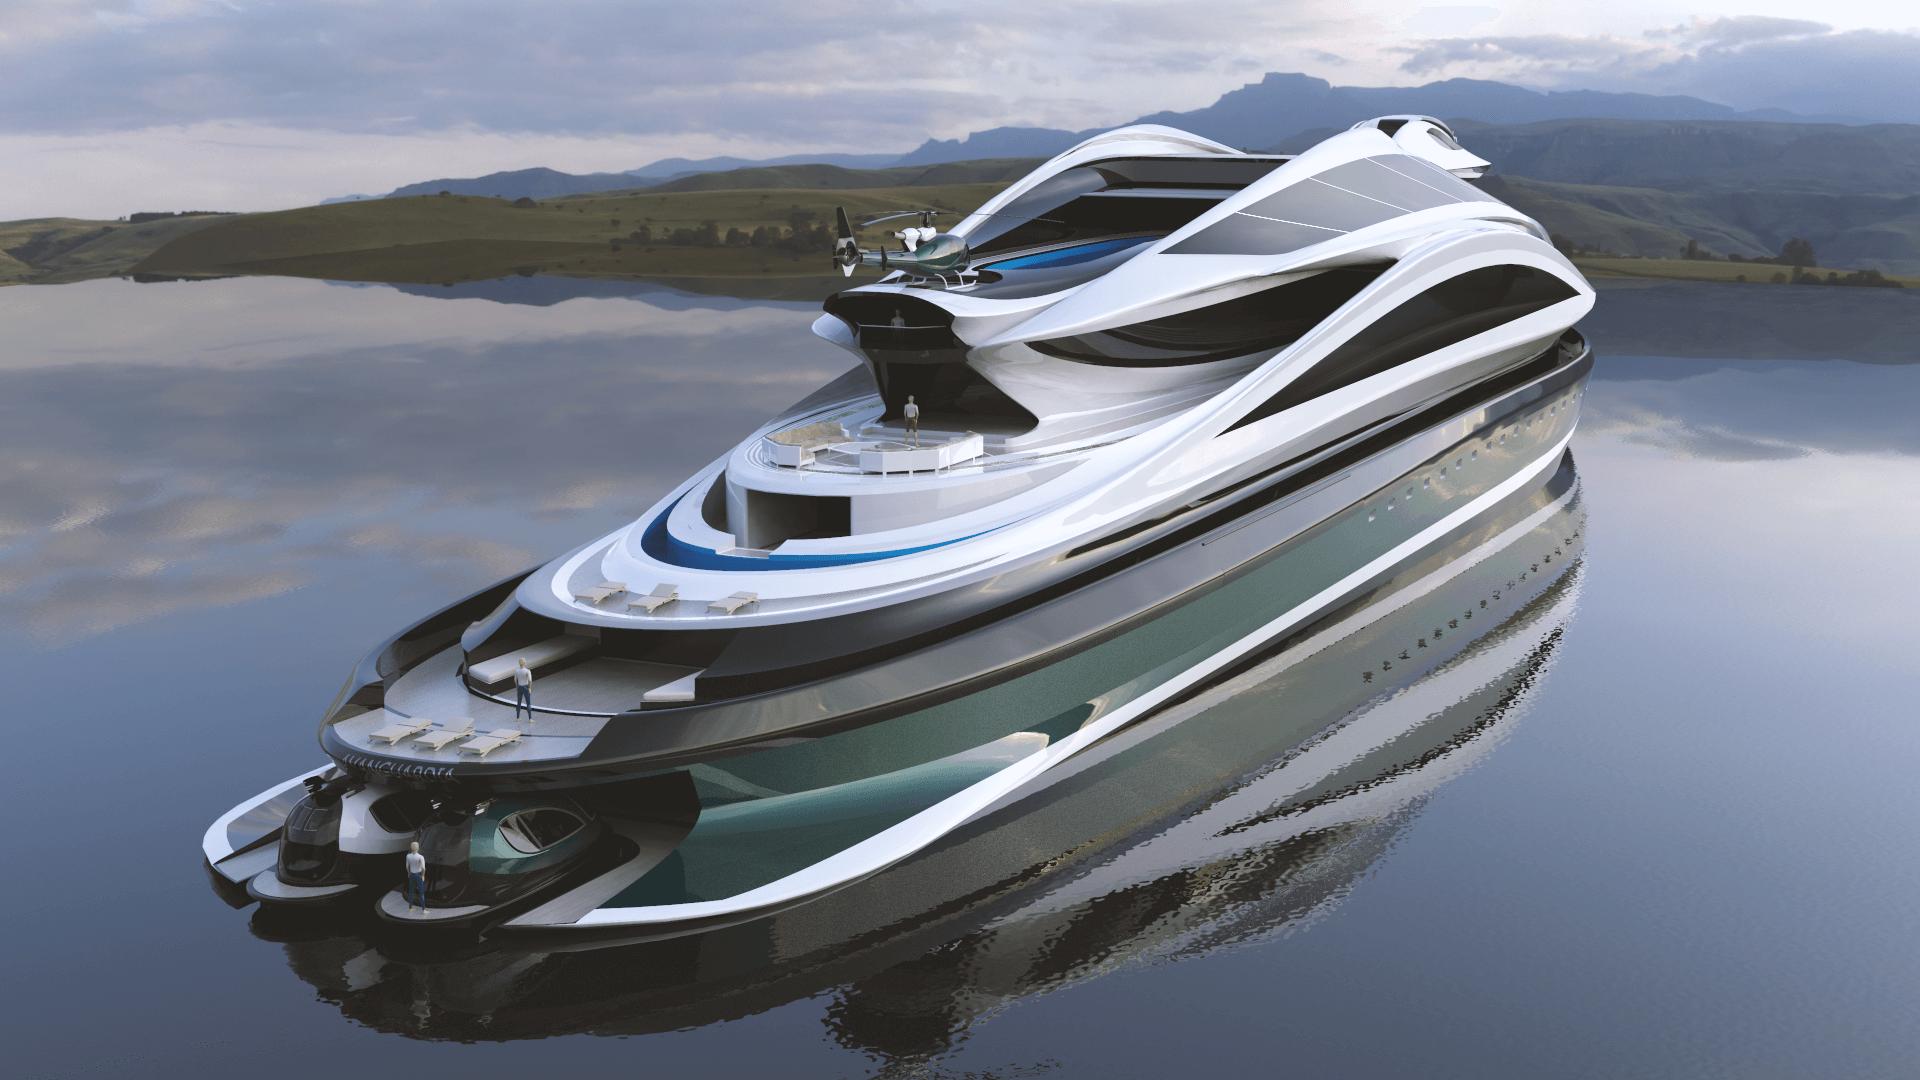 Superyacht Concept Avanguardia The Swan by Lazzarini Studio Design 137 meters